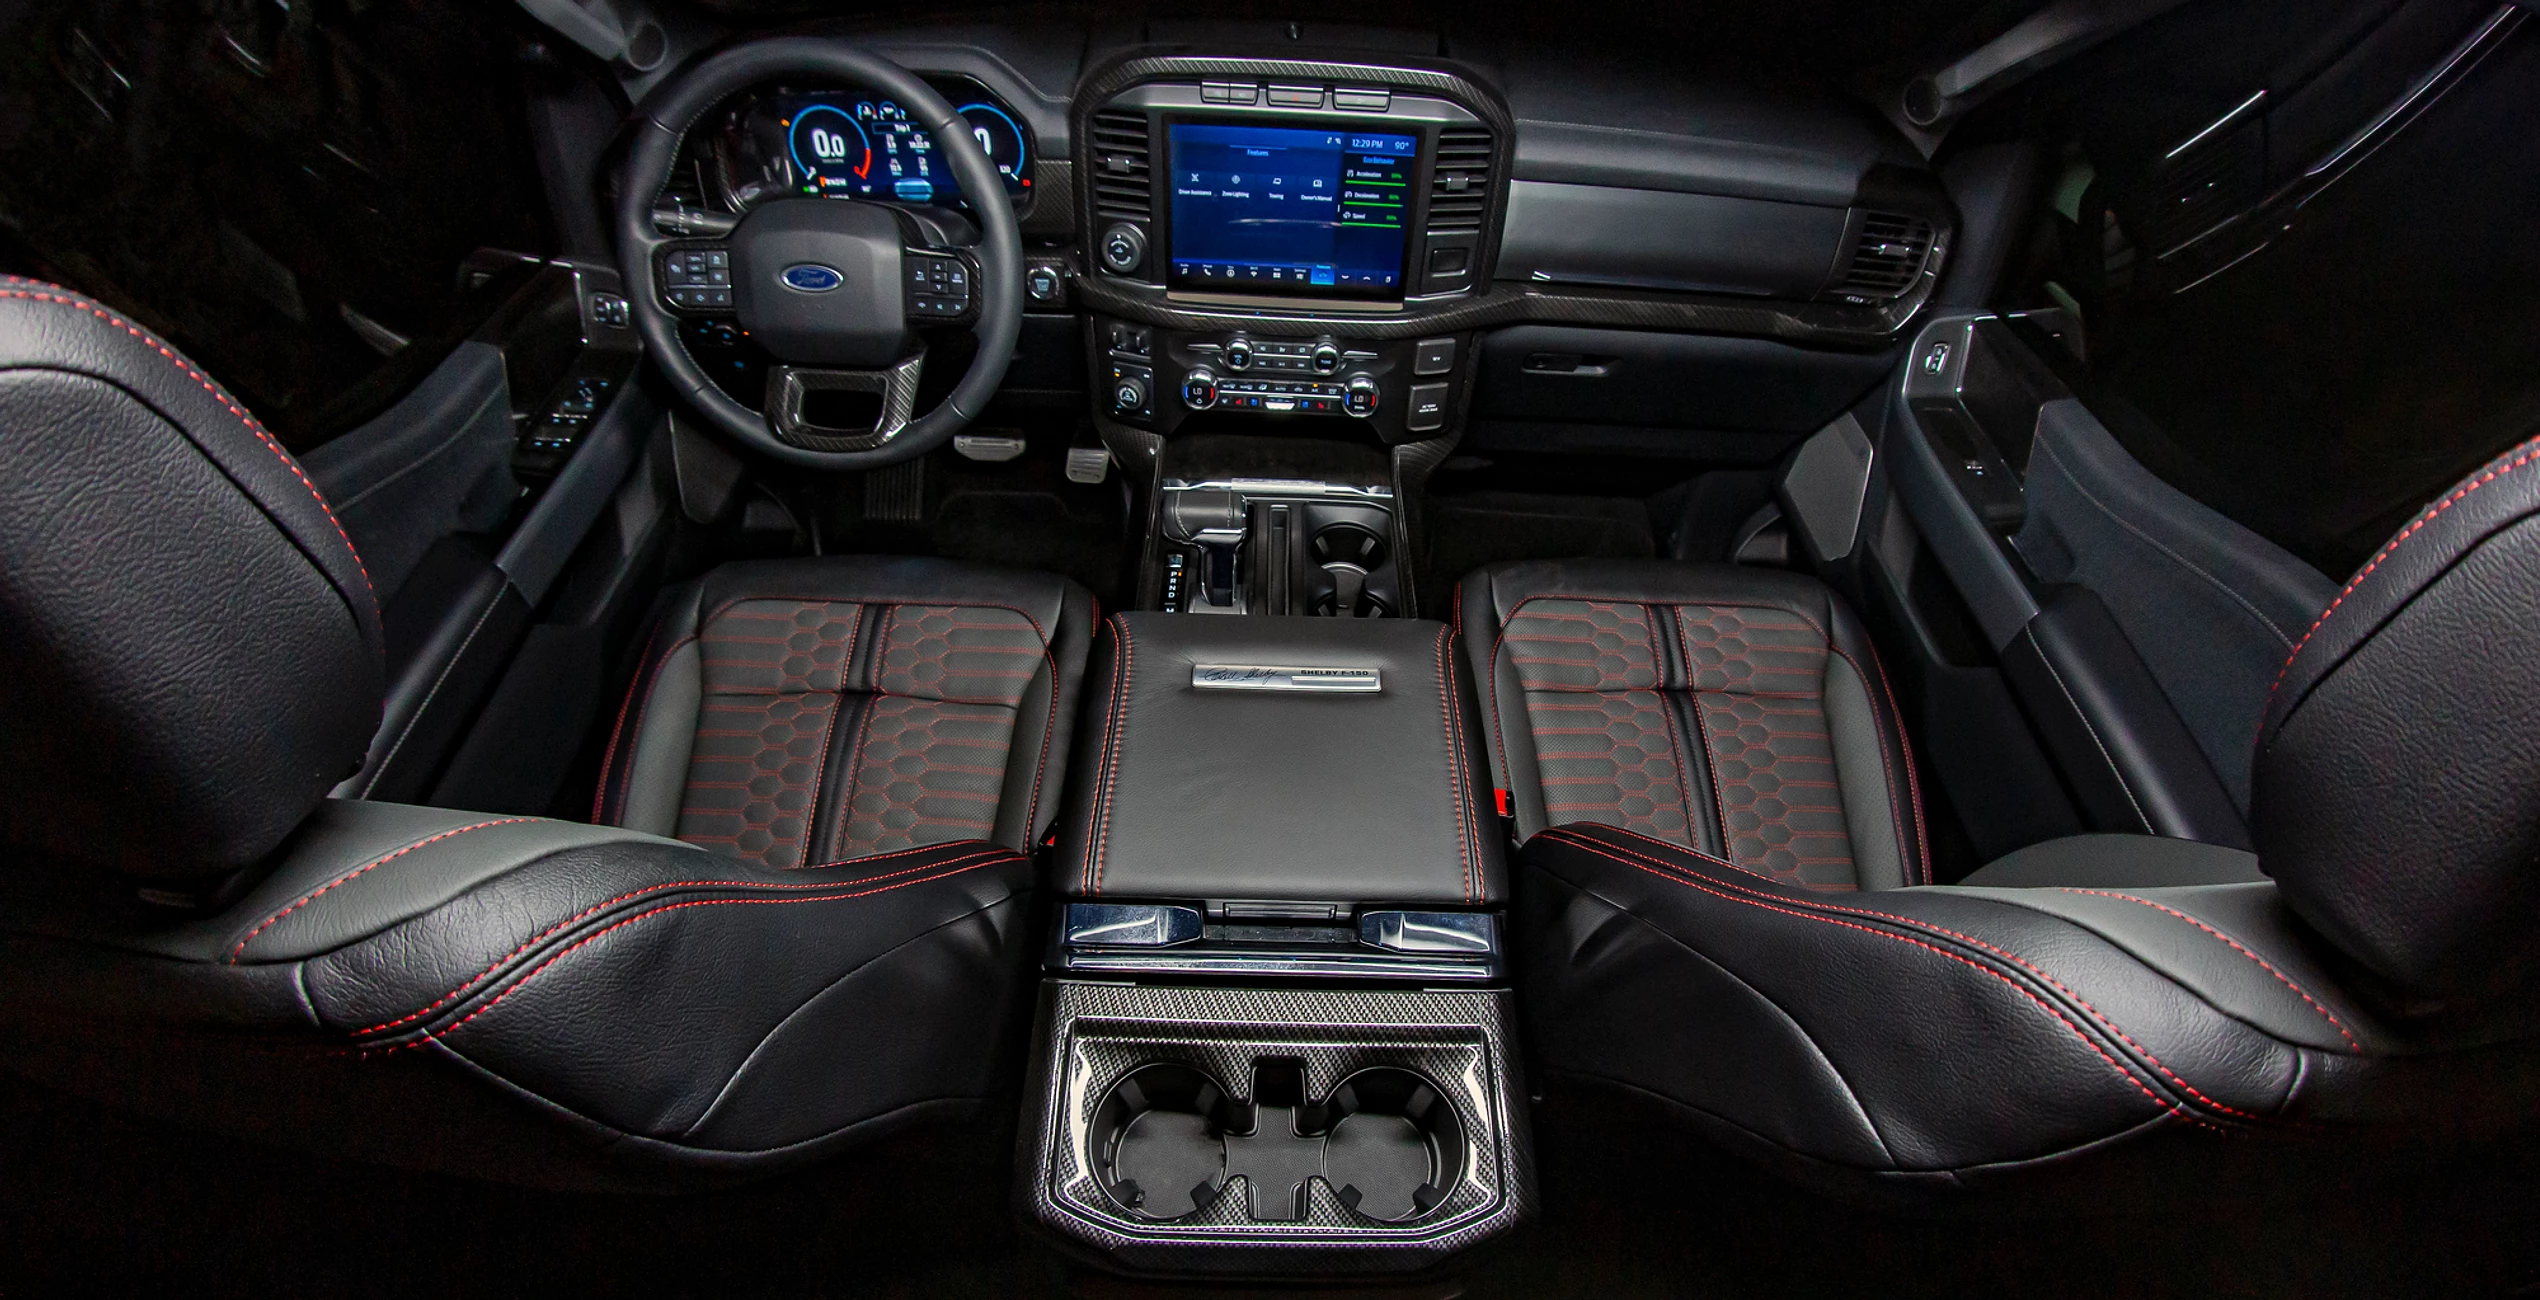 Shelby F150 2021 interni